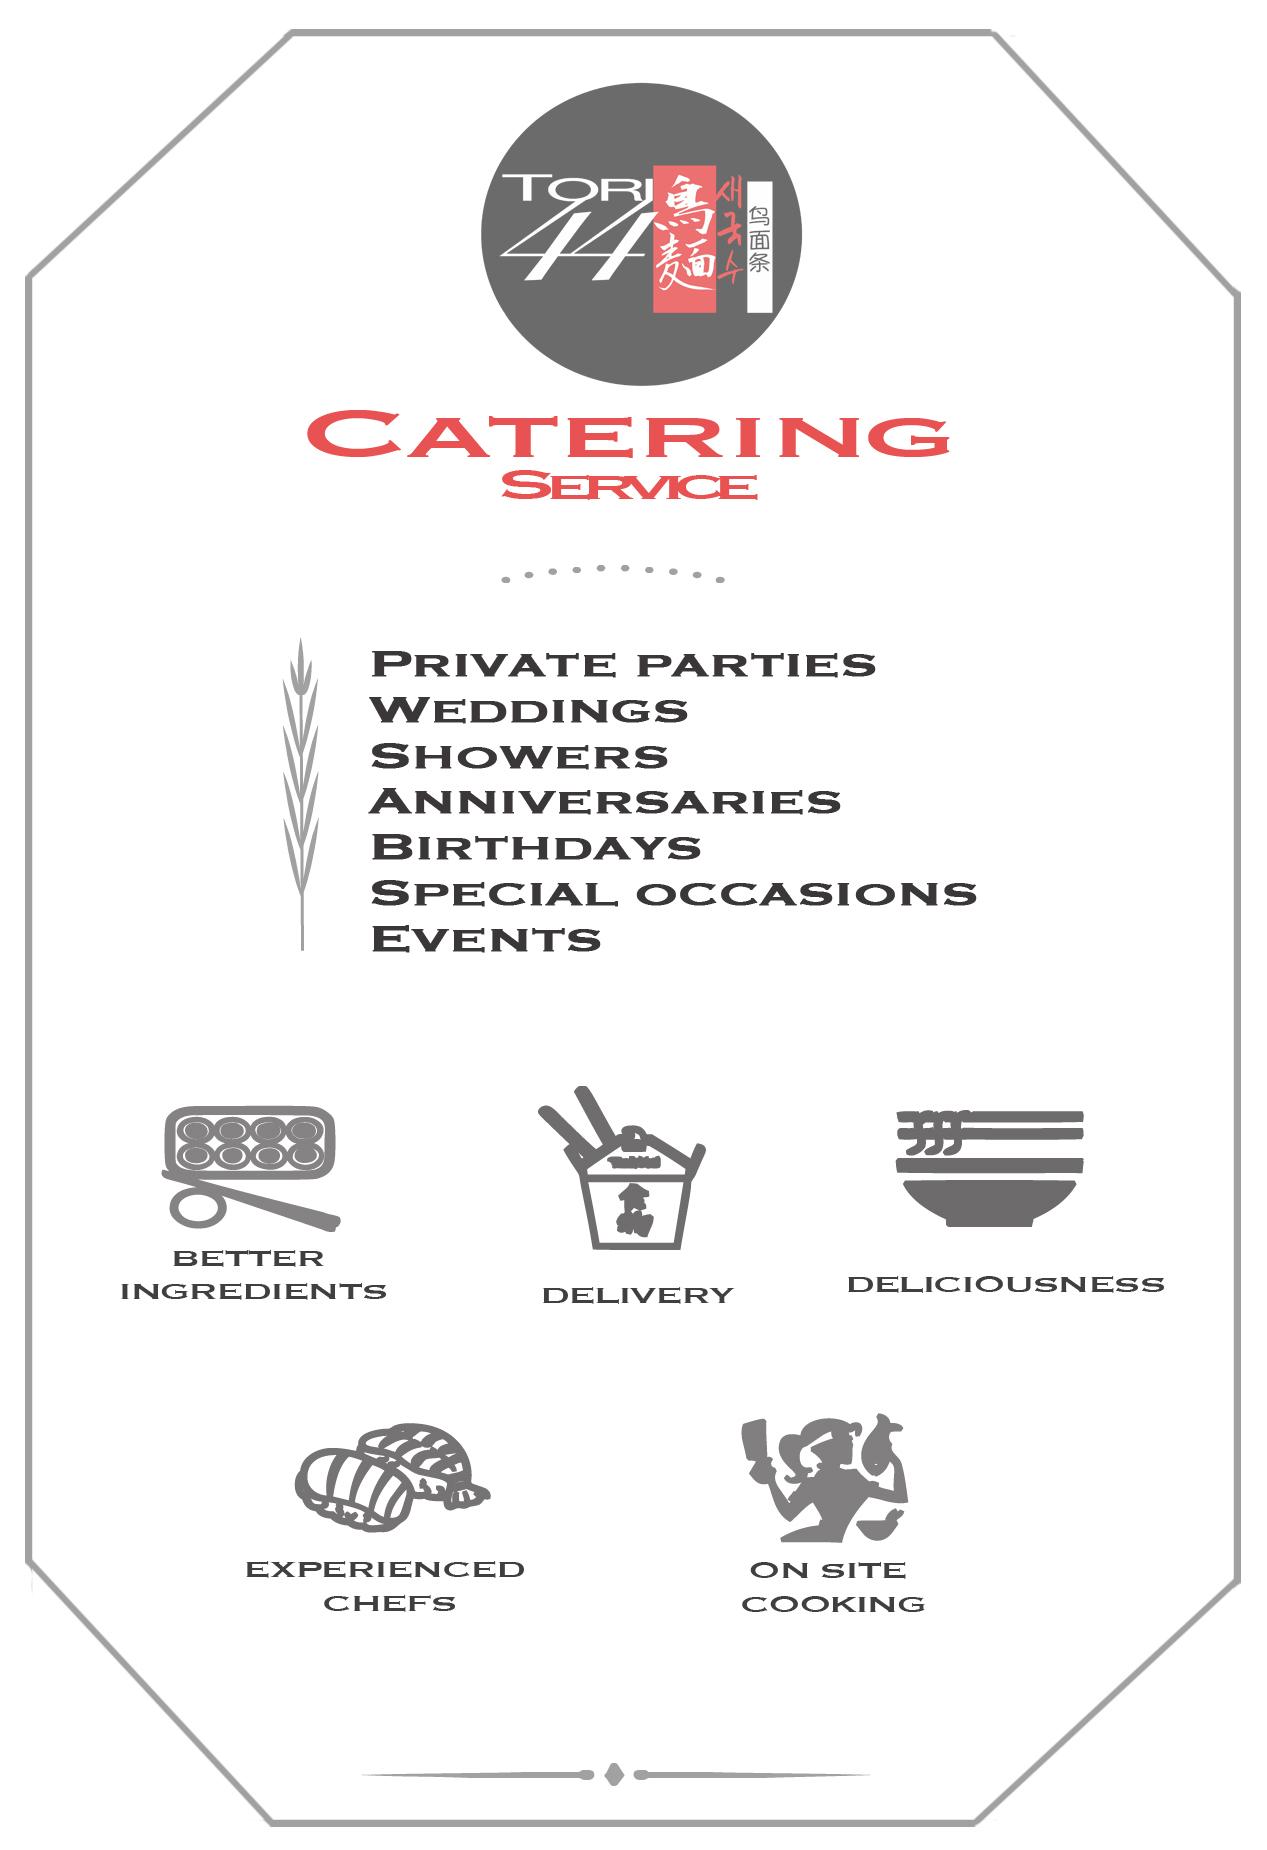 cateringtoriweb.jpg